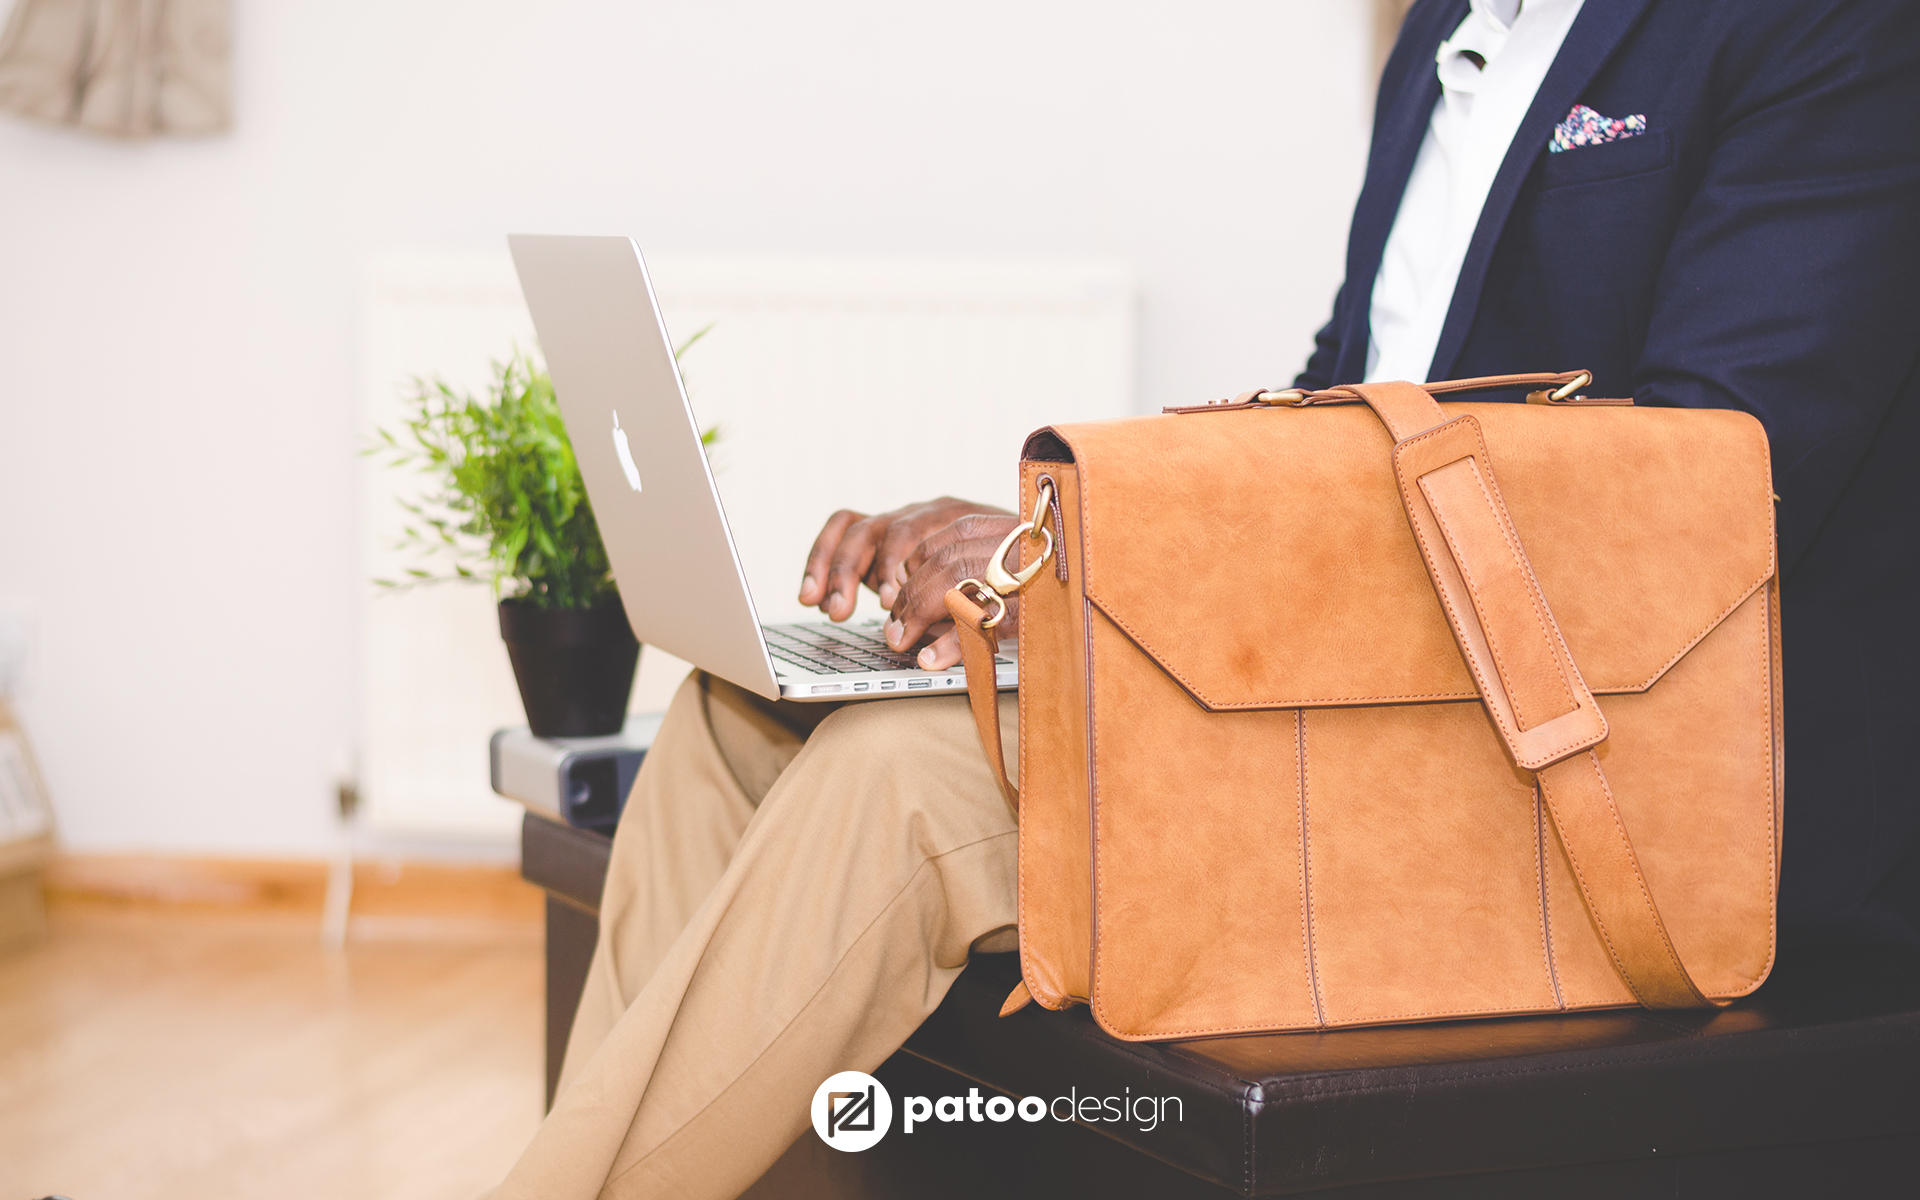 Patoo Design